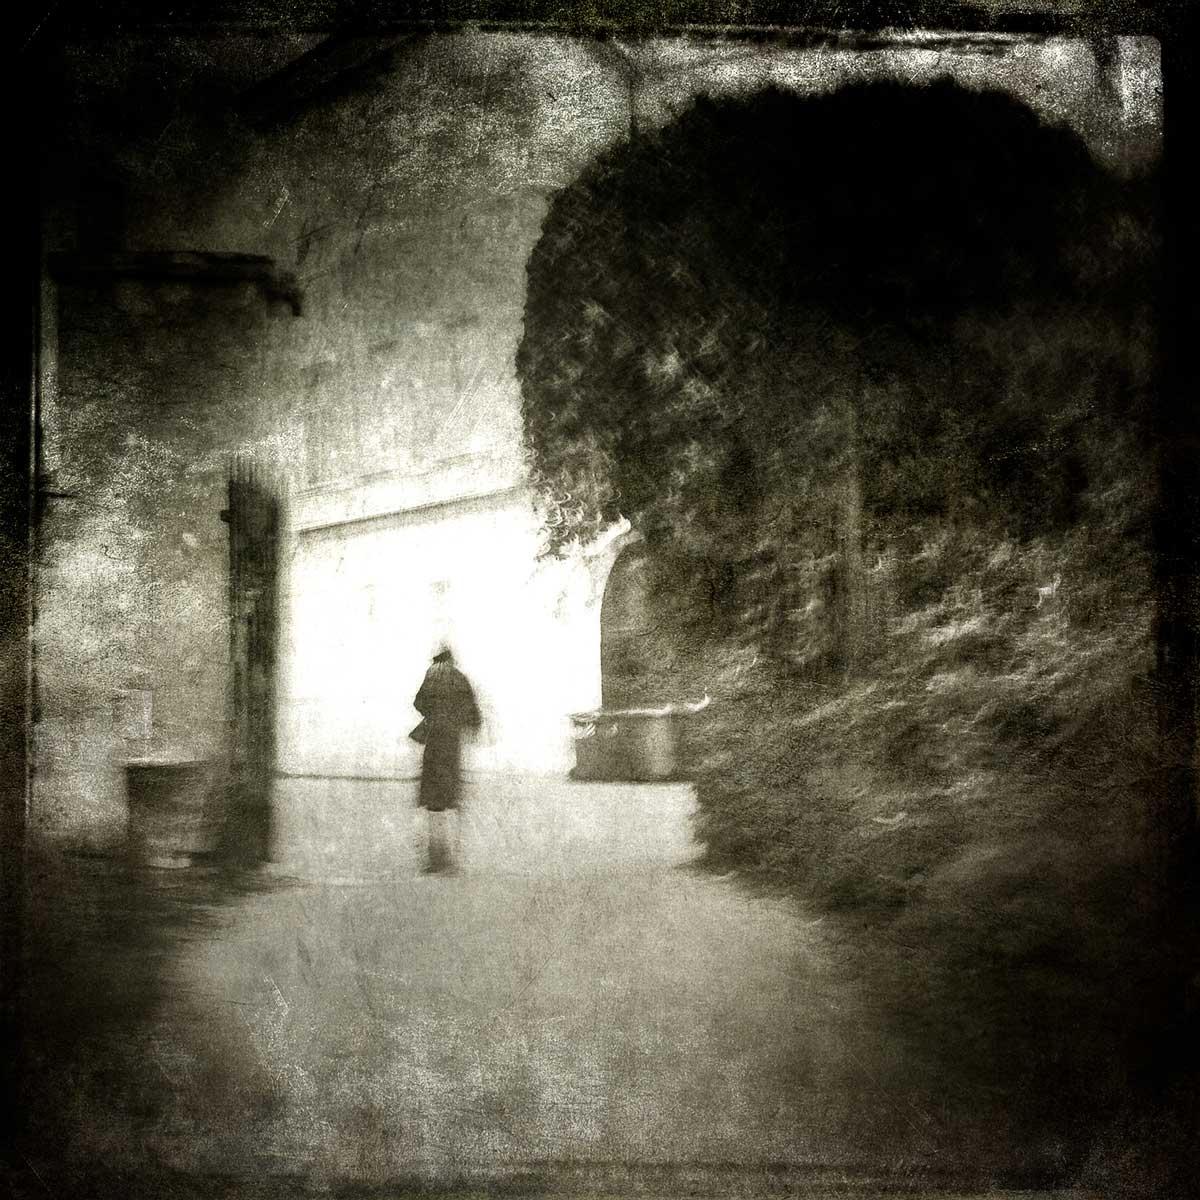 OldWoman_leaving_the_park.jpg